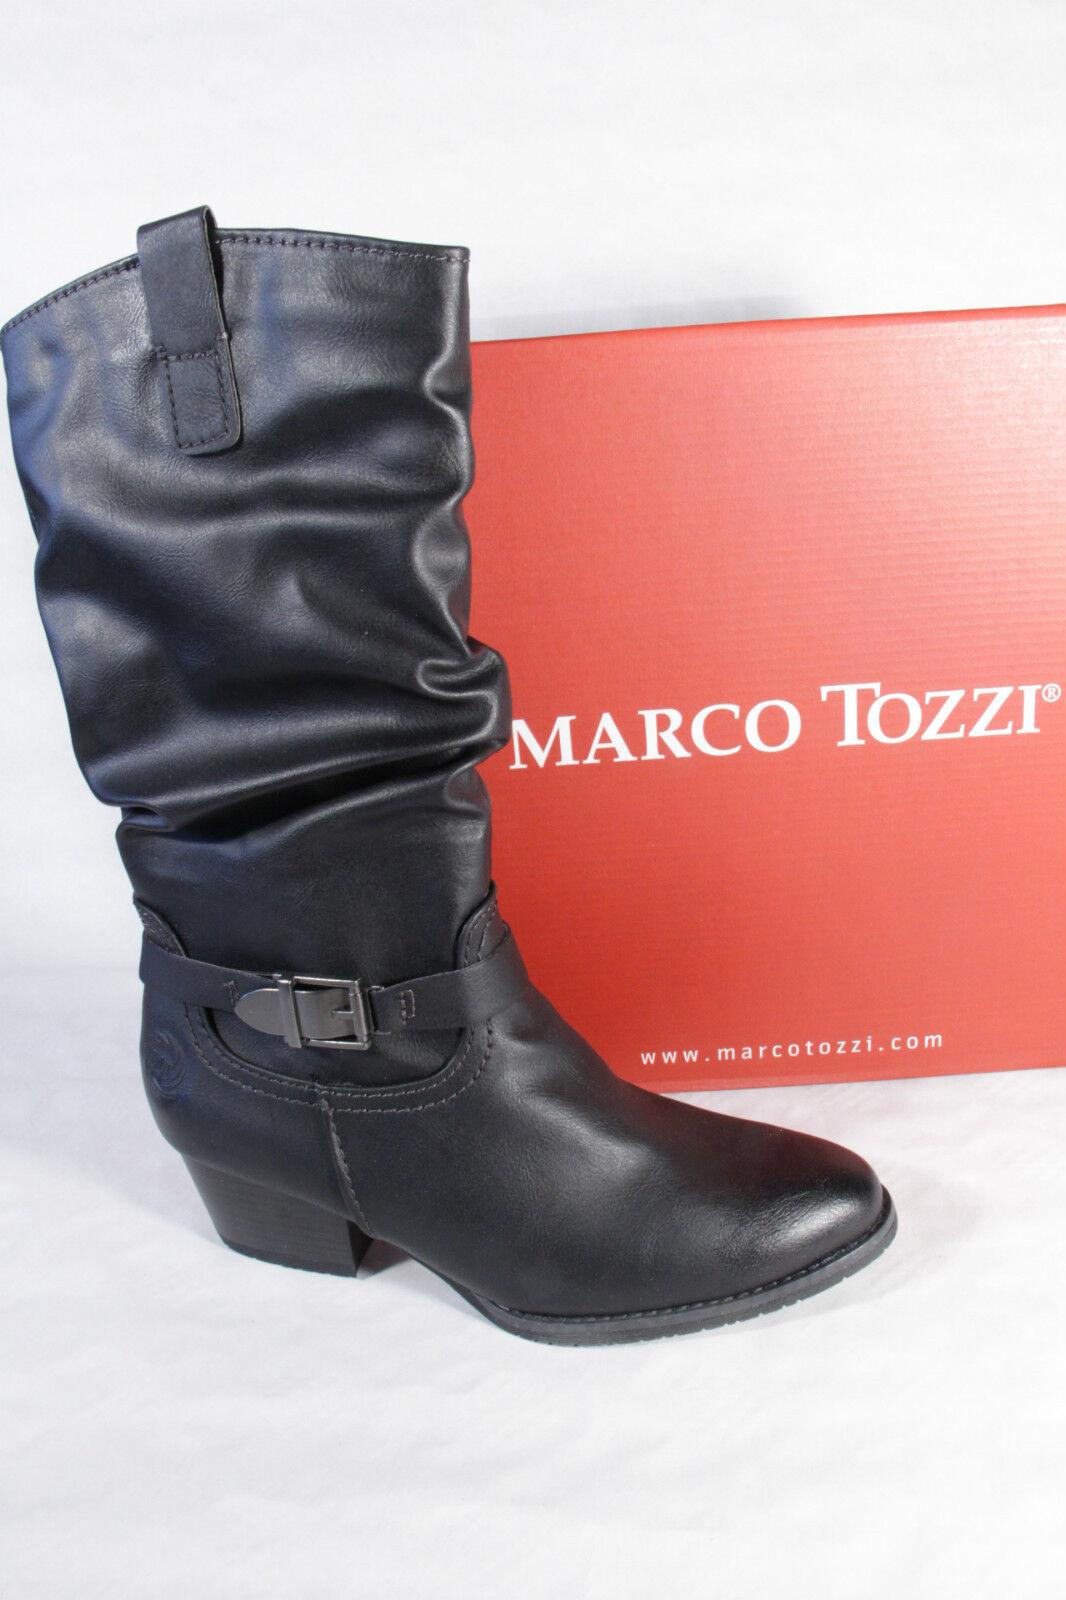 Marco Tozzi botas Mujer Botines Negros, Ligero Forrado, Rv , 25335 Nuevo